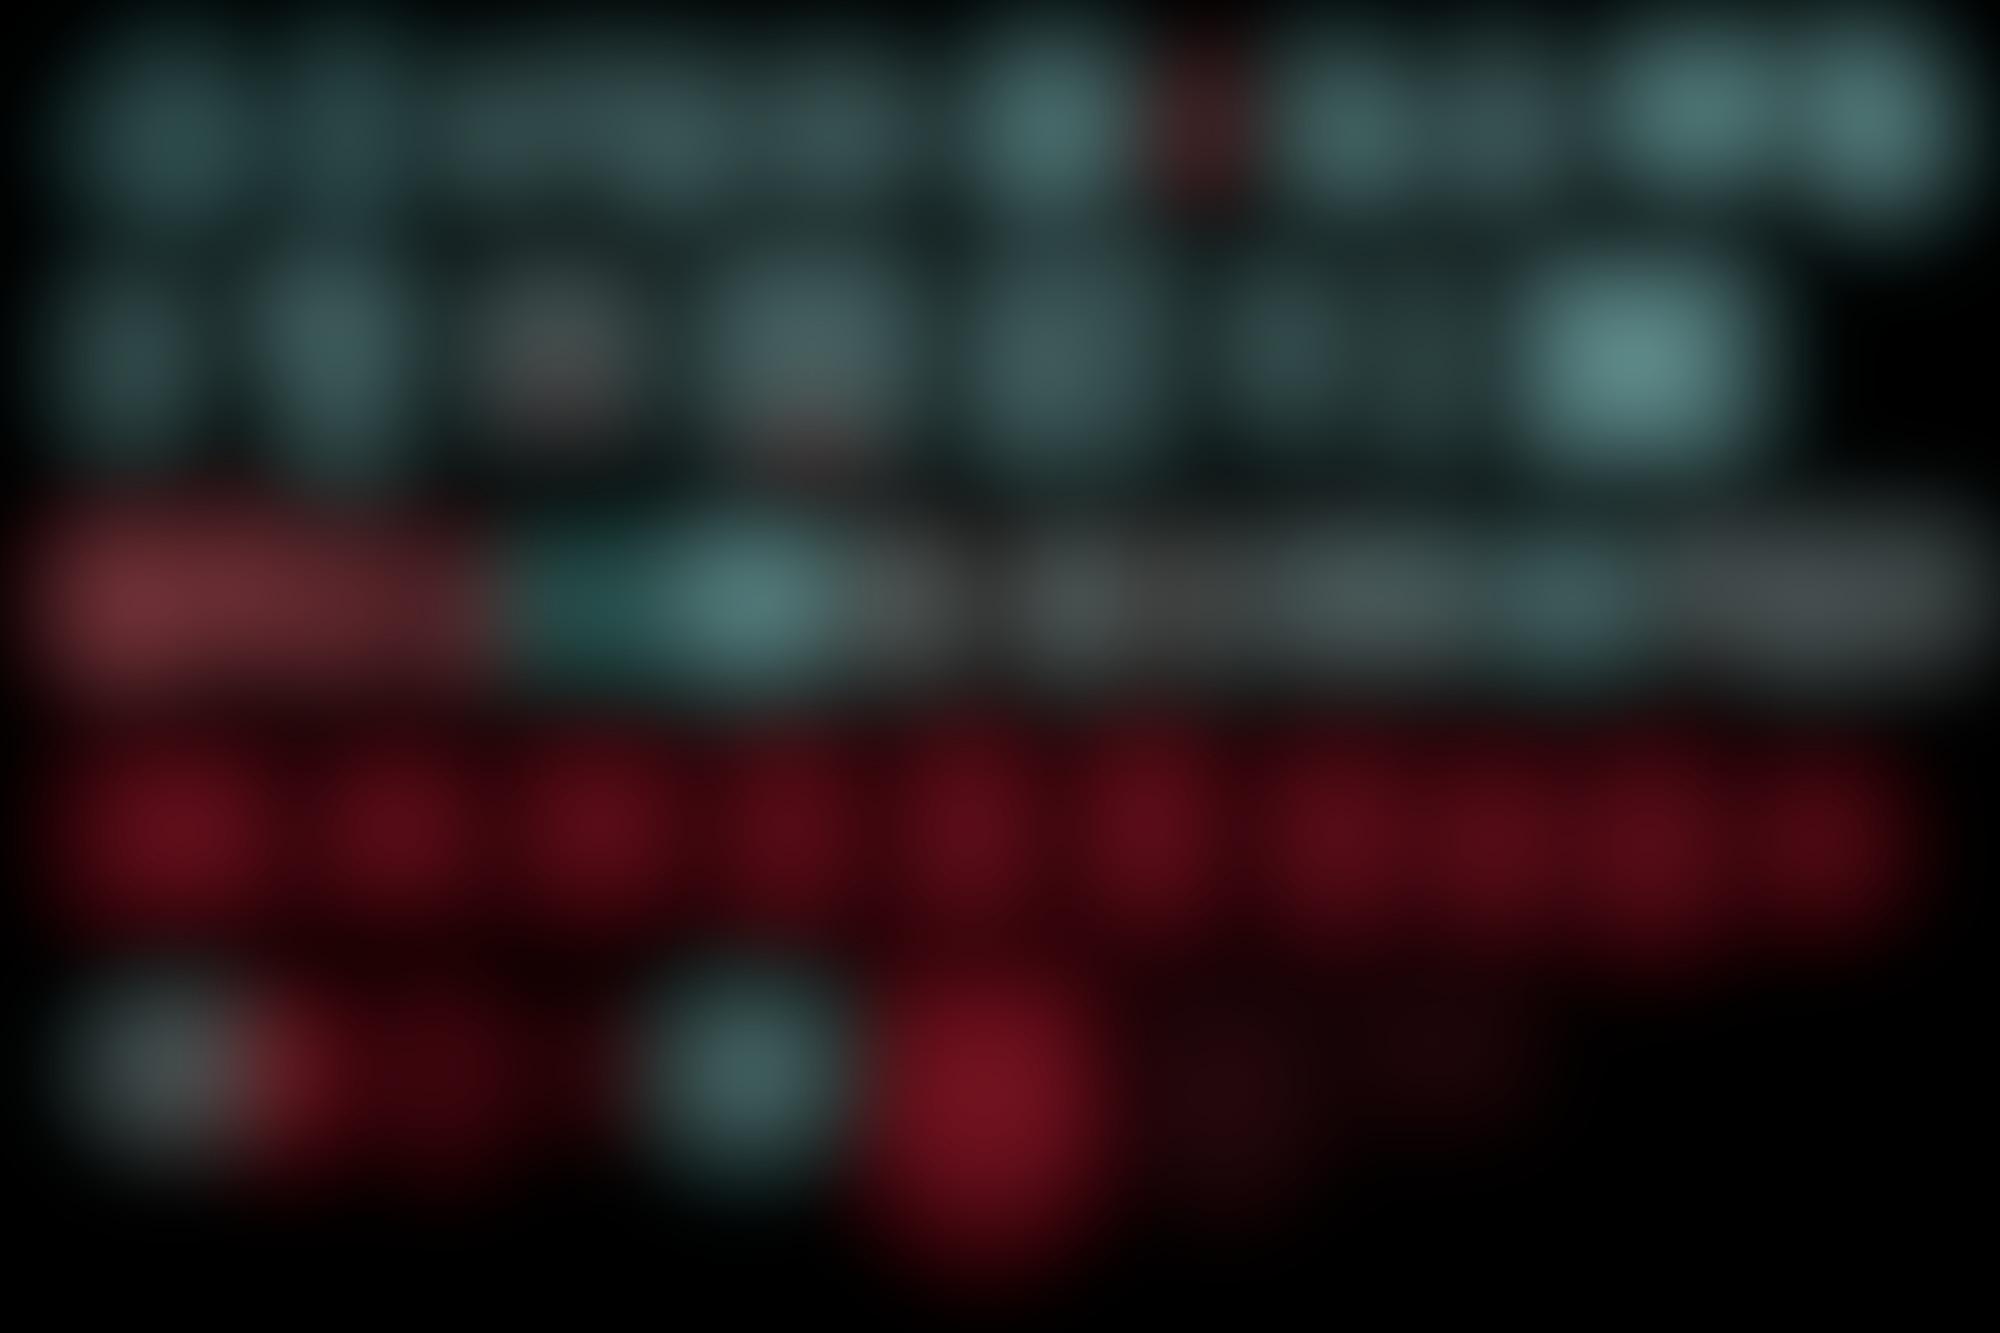 GITS SHAPES MARKS 01 01 autocompressfitresizeixlibphp 1 1 0max h2000max w3 D2000q80sf3f29b451b363e4026b8d5b96f9f421d